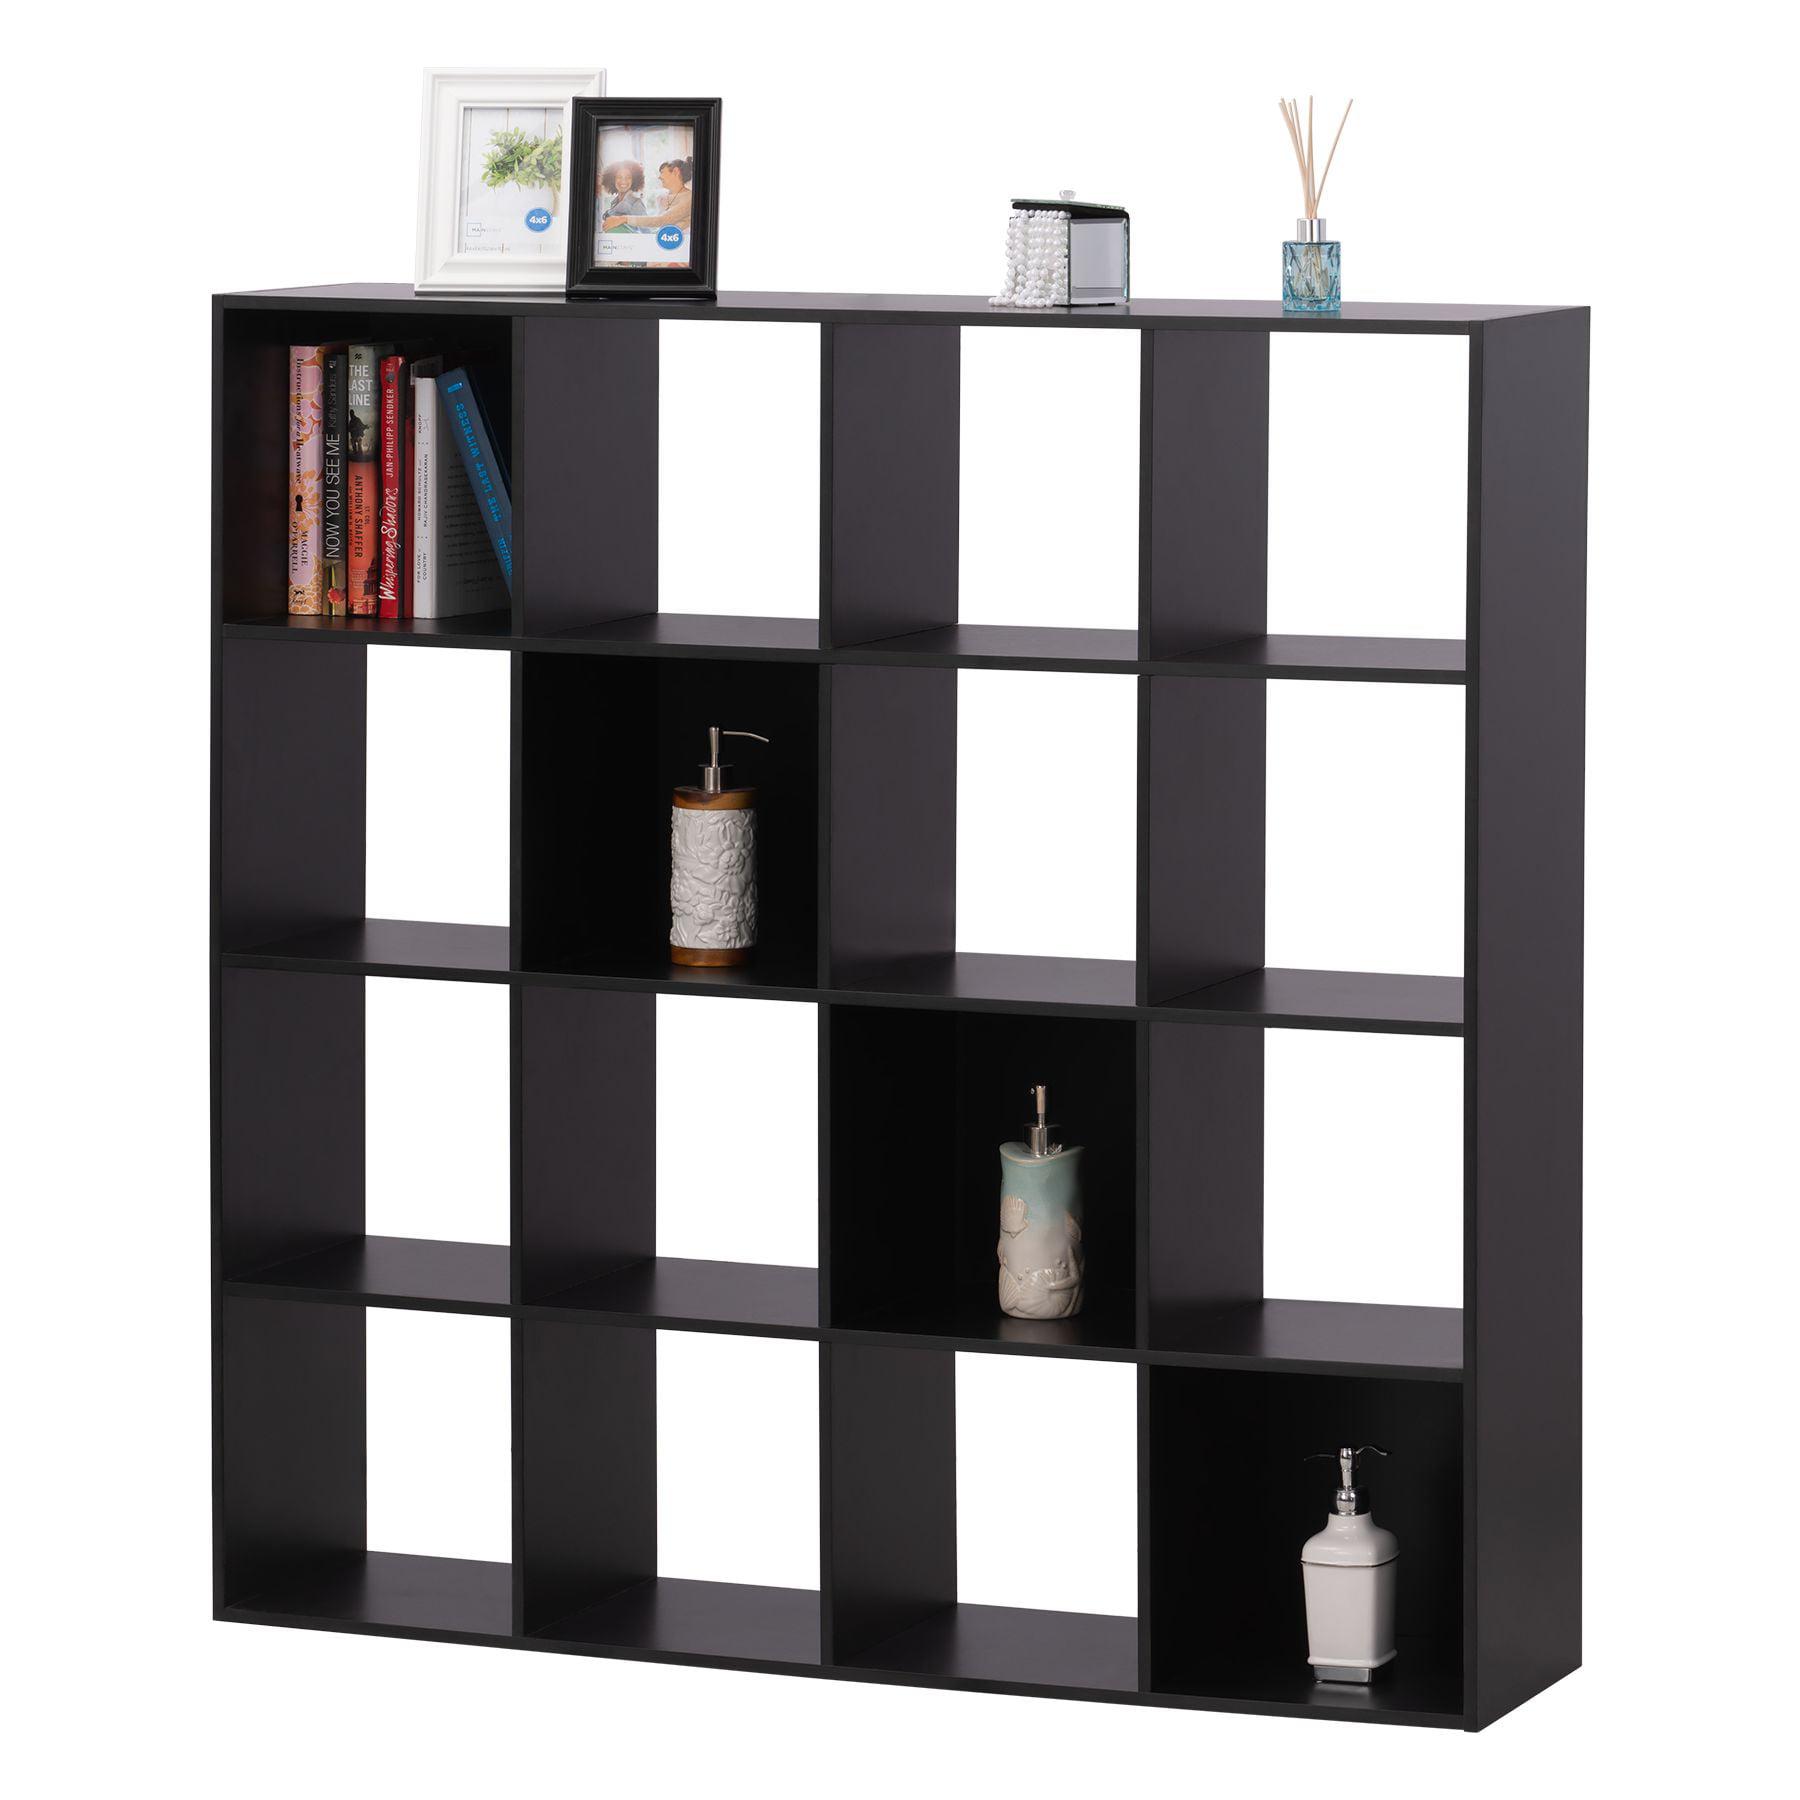 Fineboard 16 Cube Bookshelf Storage Cabinet Organizer Home Office